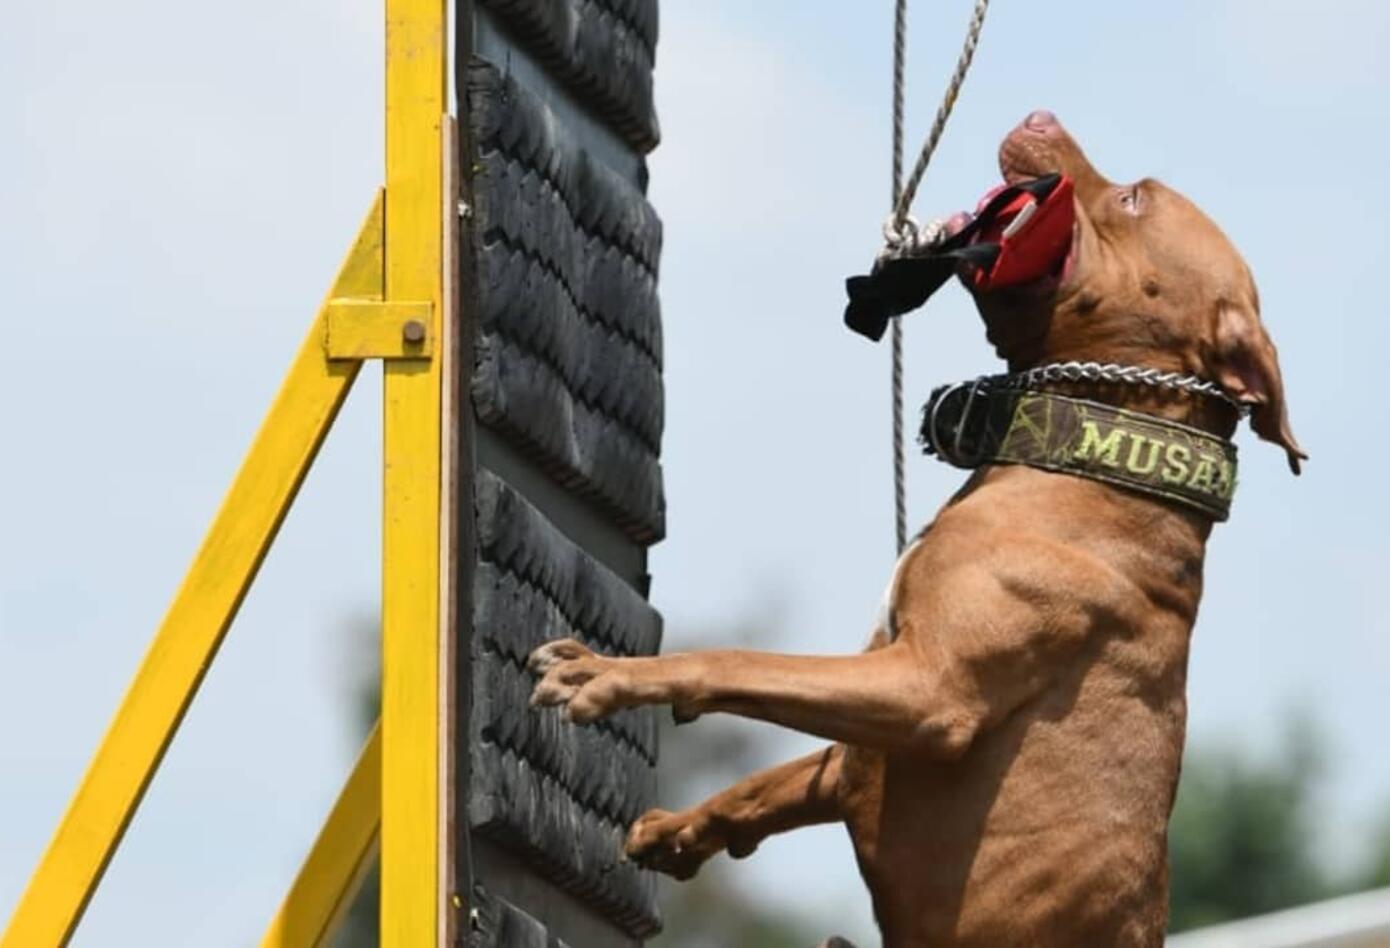 La feria de Cali tuvo por primera vez un Festival de Mascotas